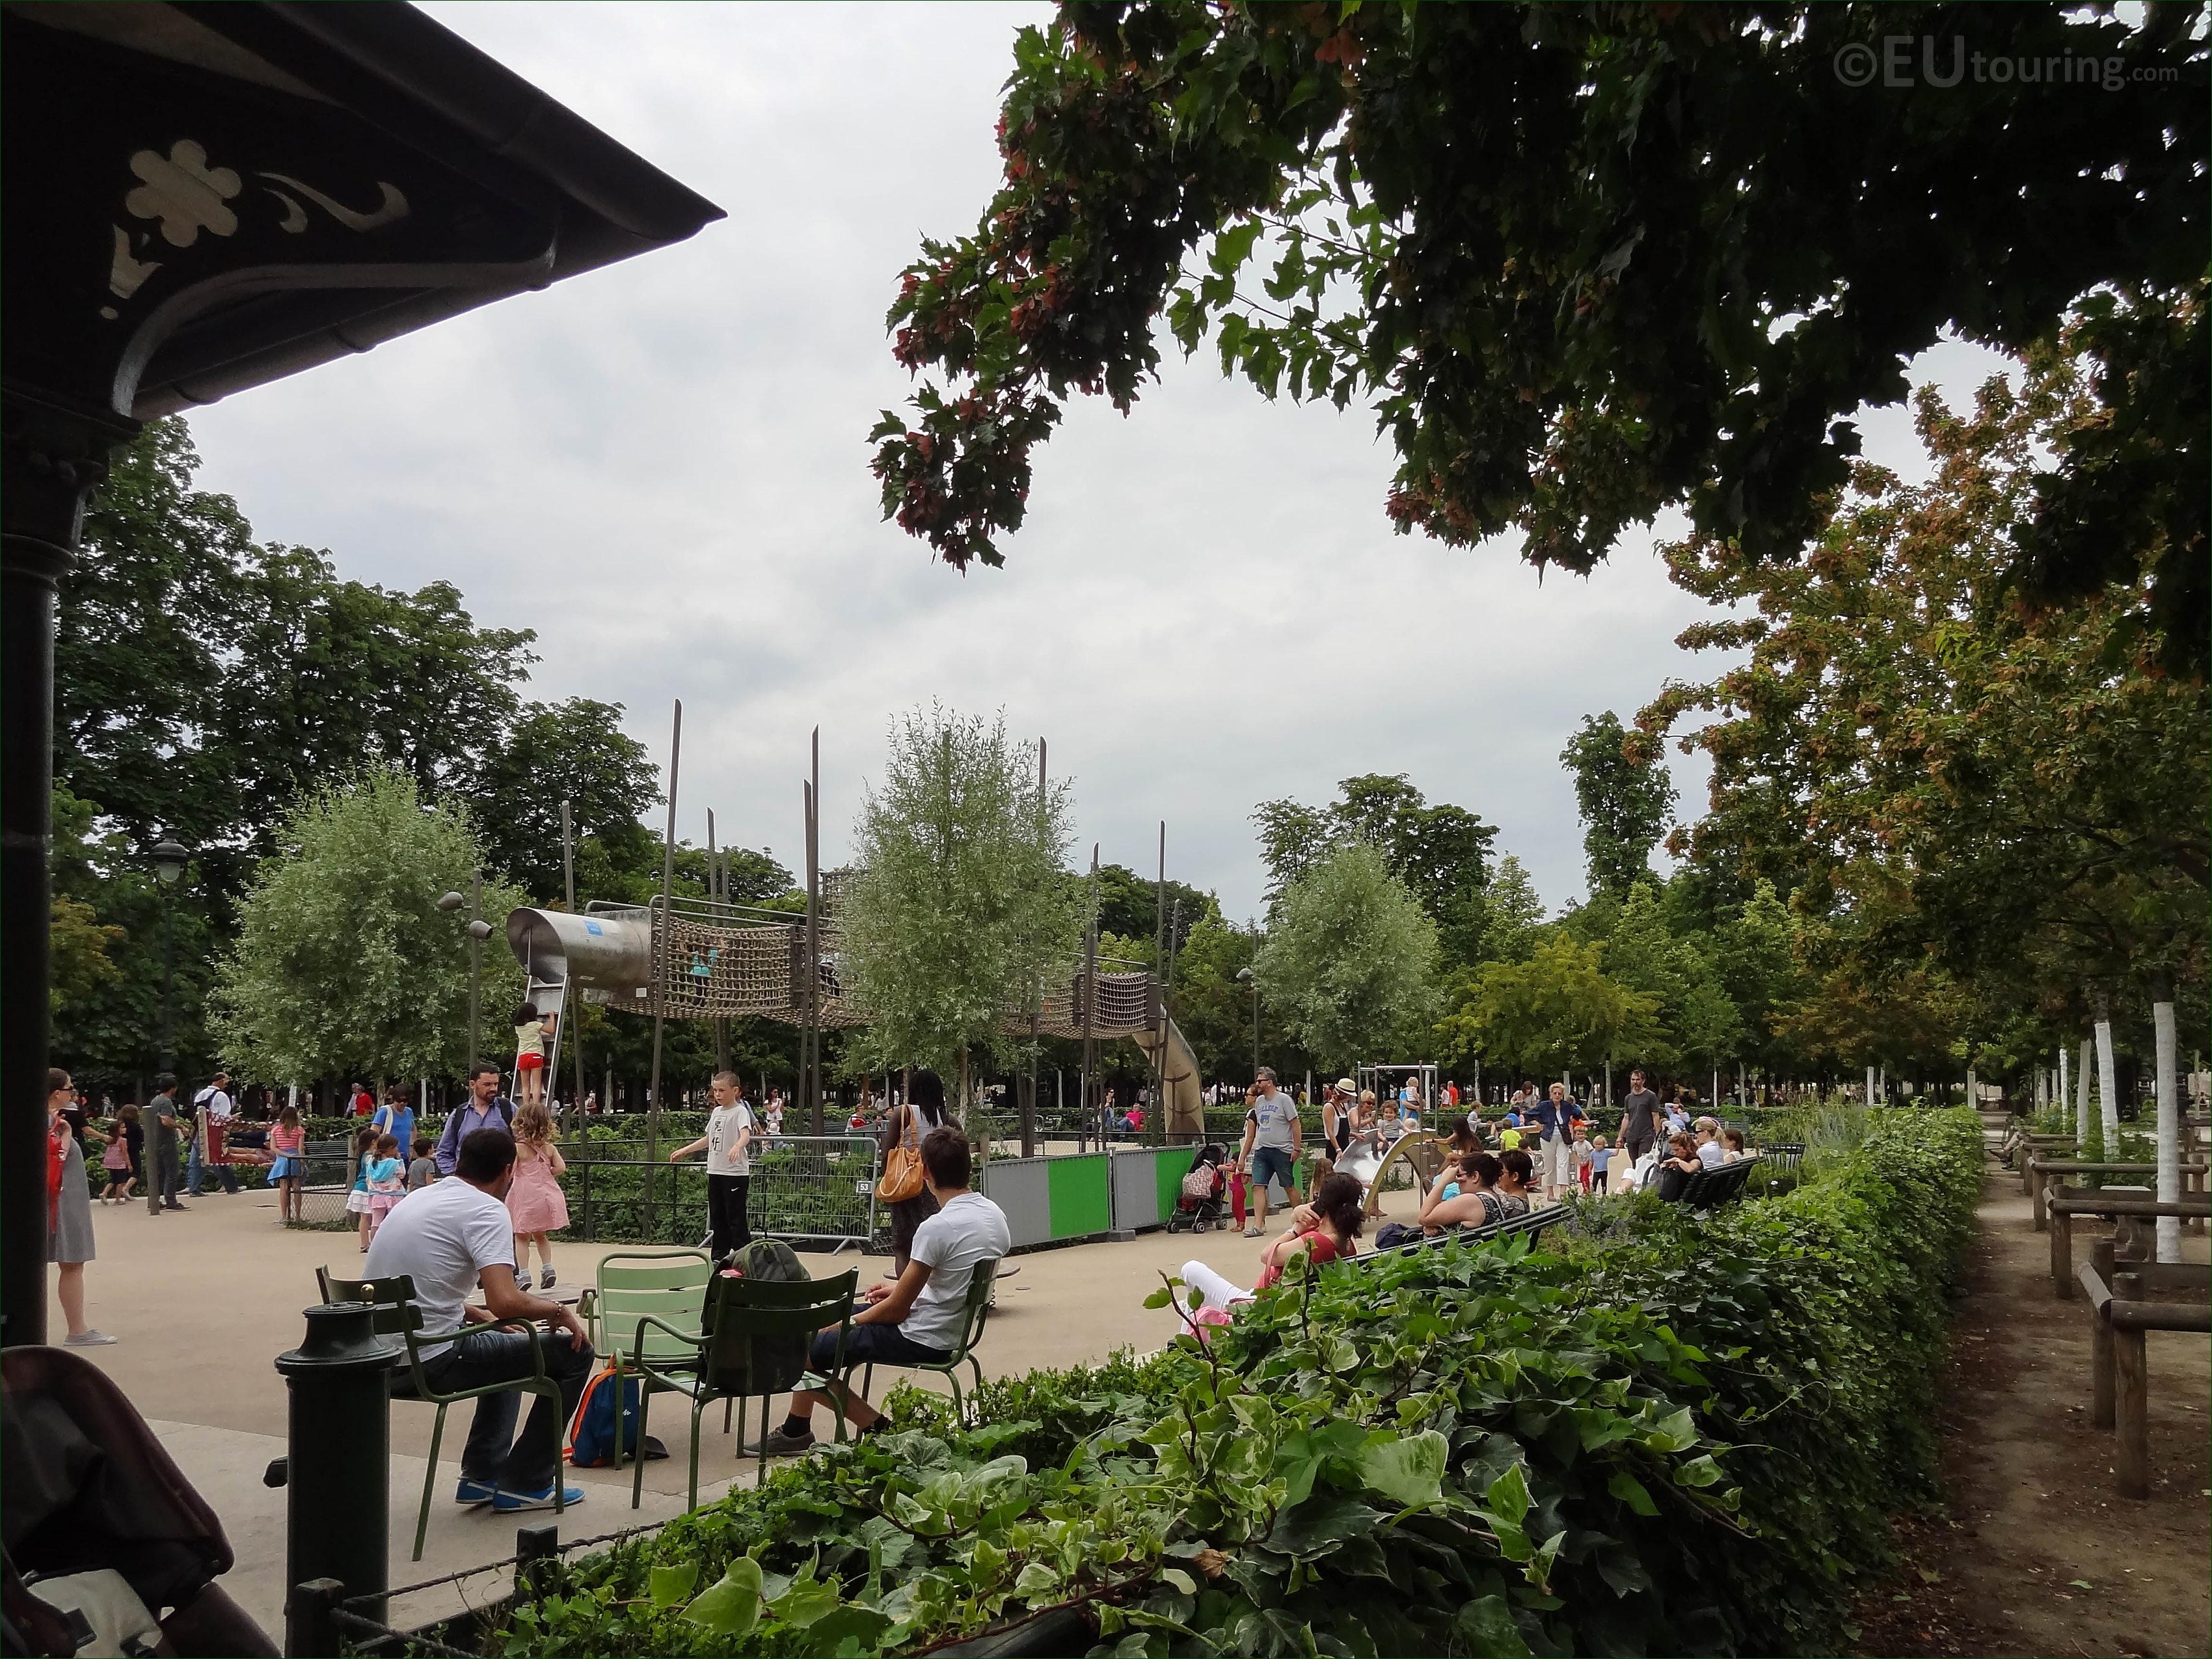 Childrens playground inside Jardin des Tuileries - Page 51